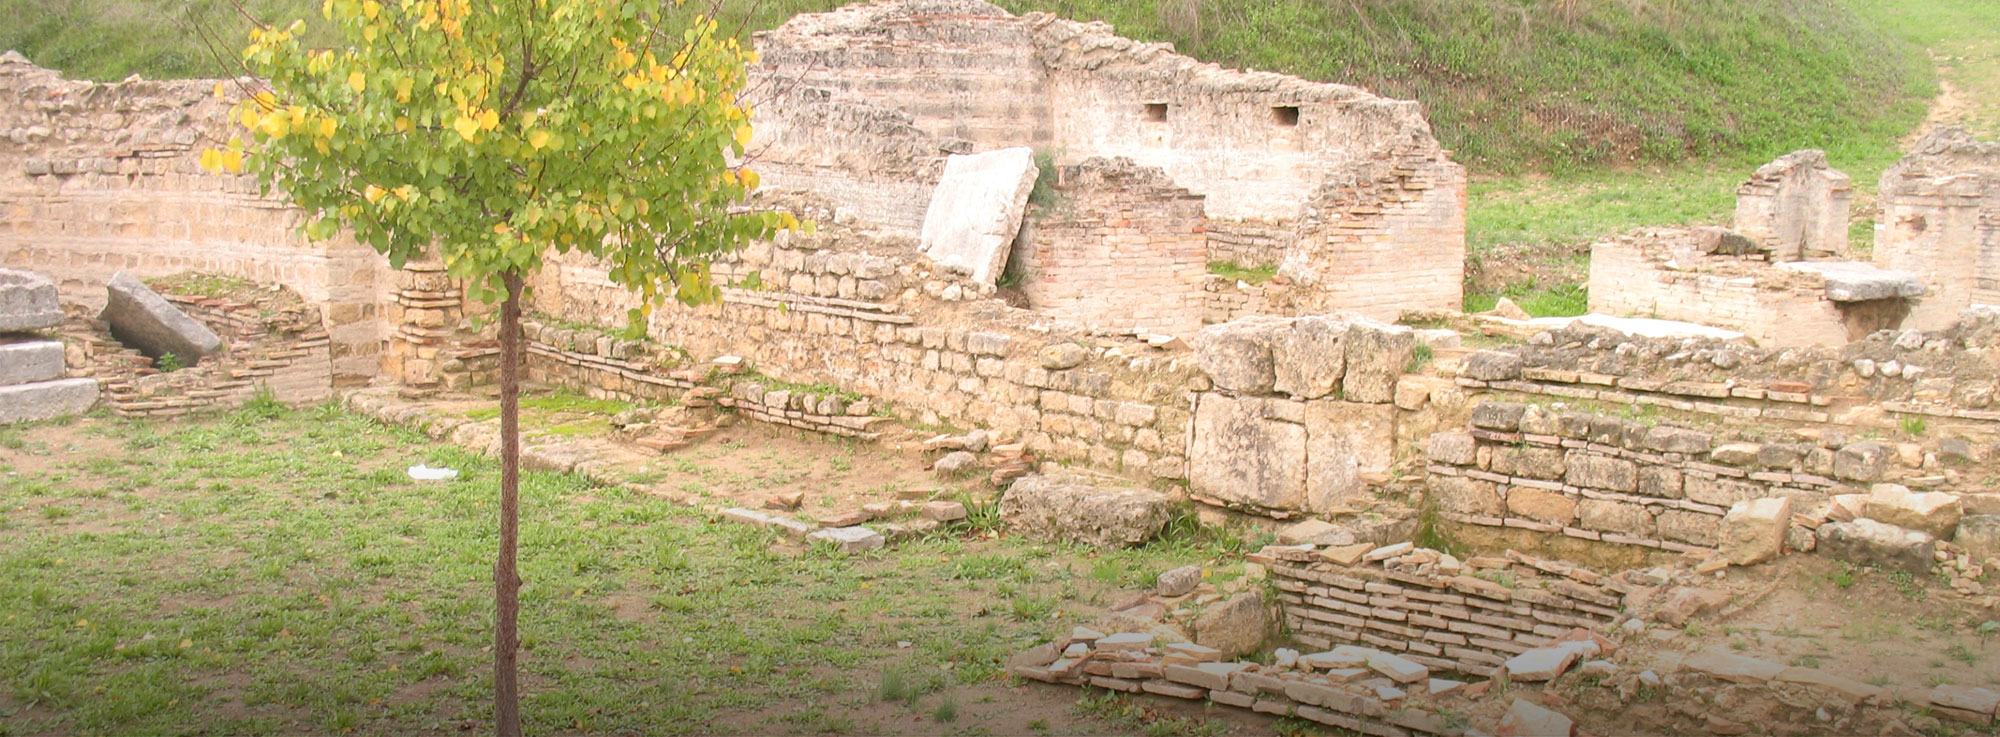 Canosa di Puglia: Archeologia e Natura